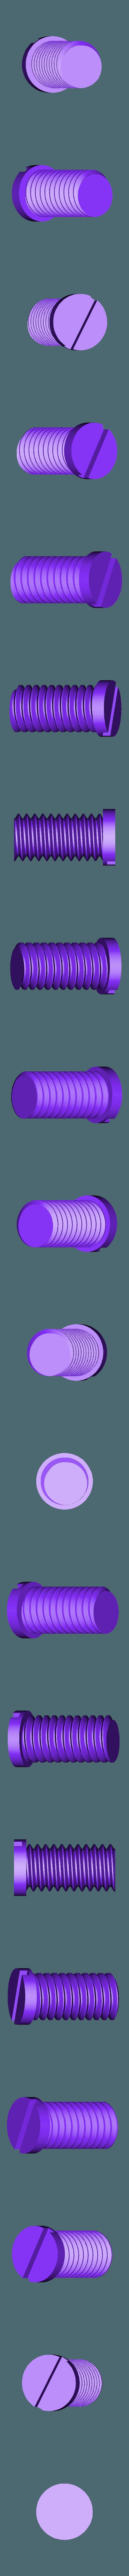 Mosqueton Spartan Carabiner Tornillo.stl Download STL file Carabiner / Carabineer - Spartan Carabiner - • 3D printable design, CHKDesign